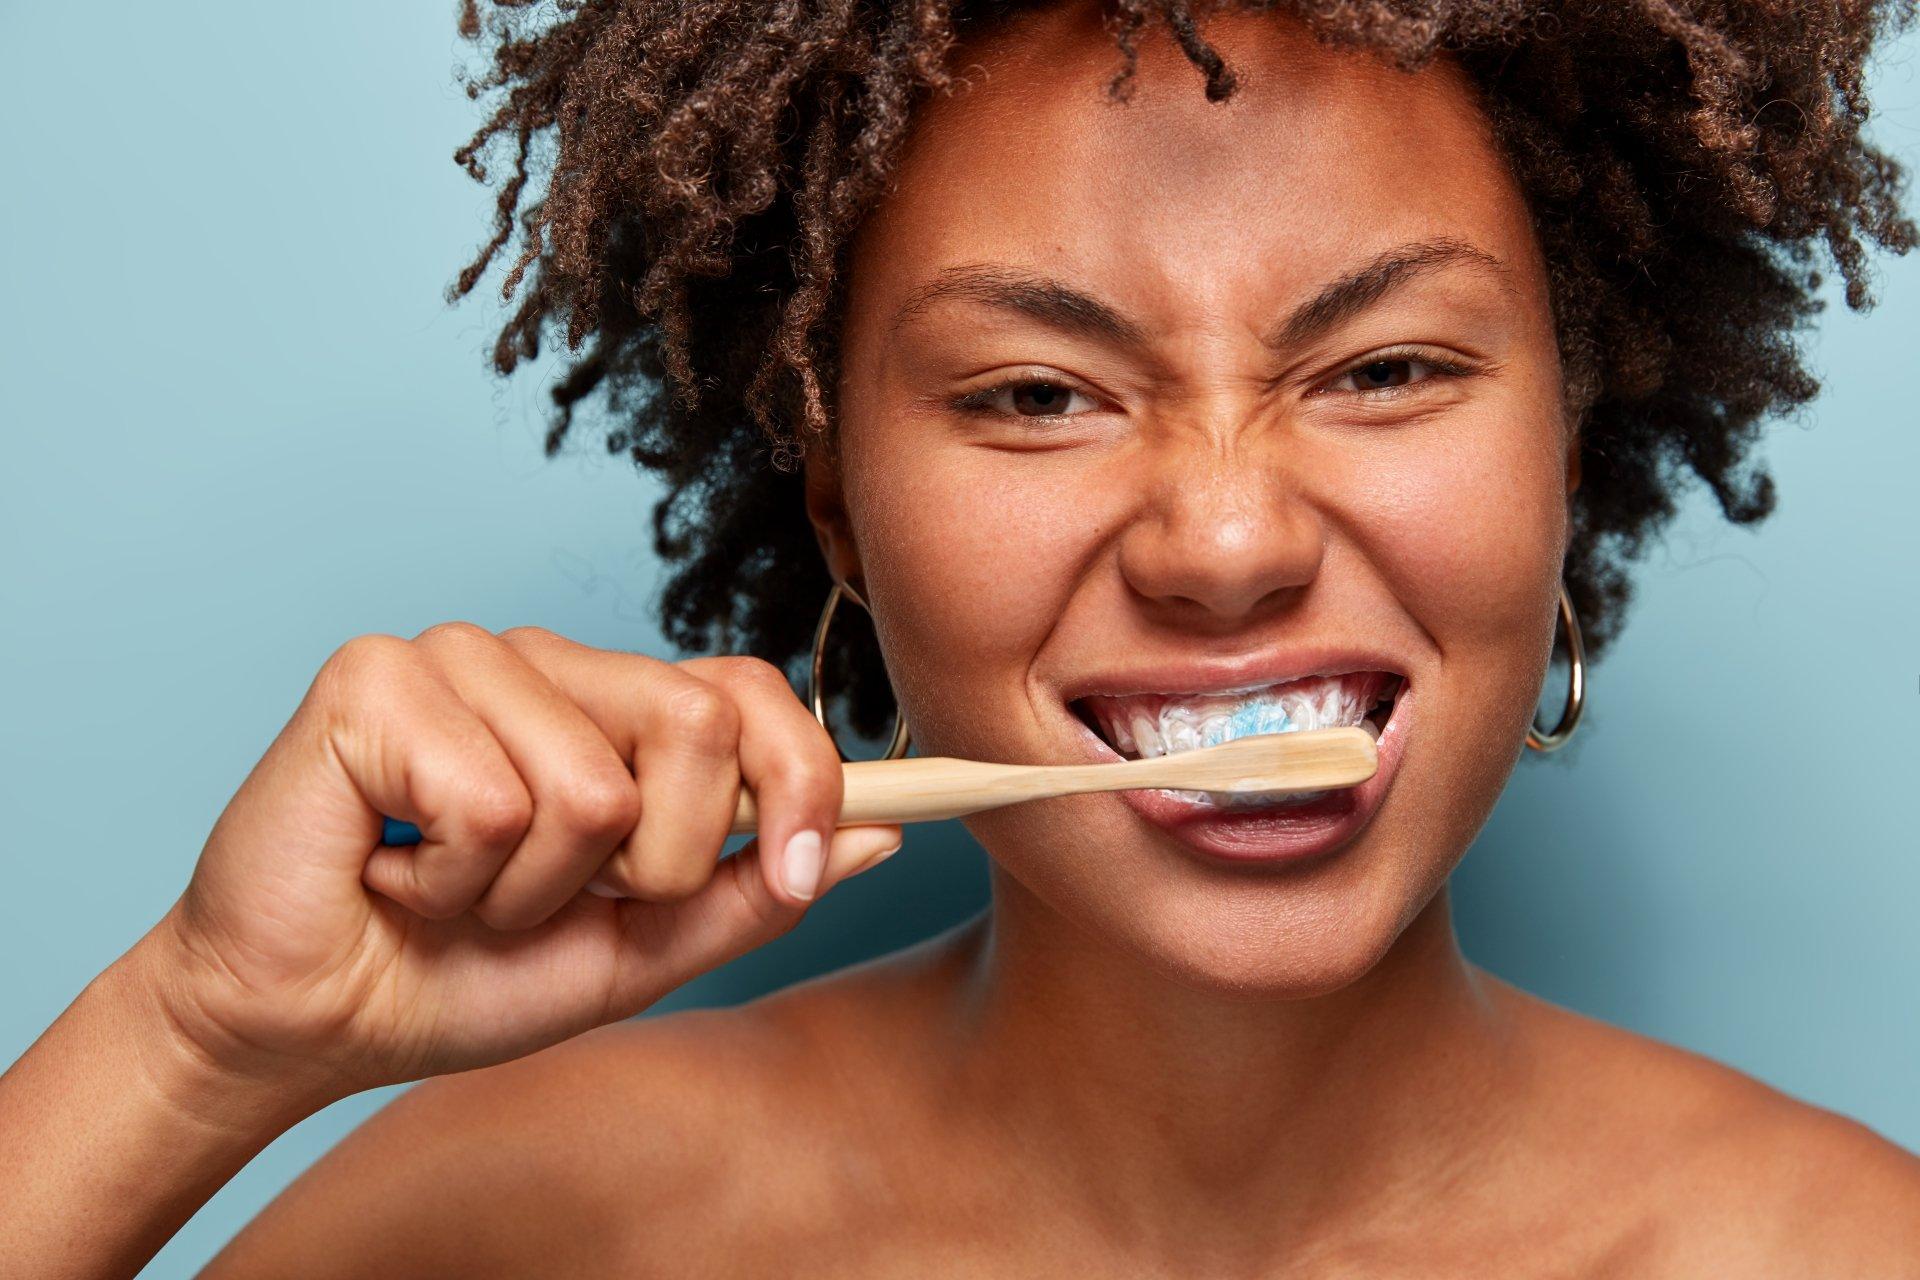 Woman of Mixed Race Brushing Teeth